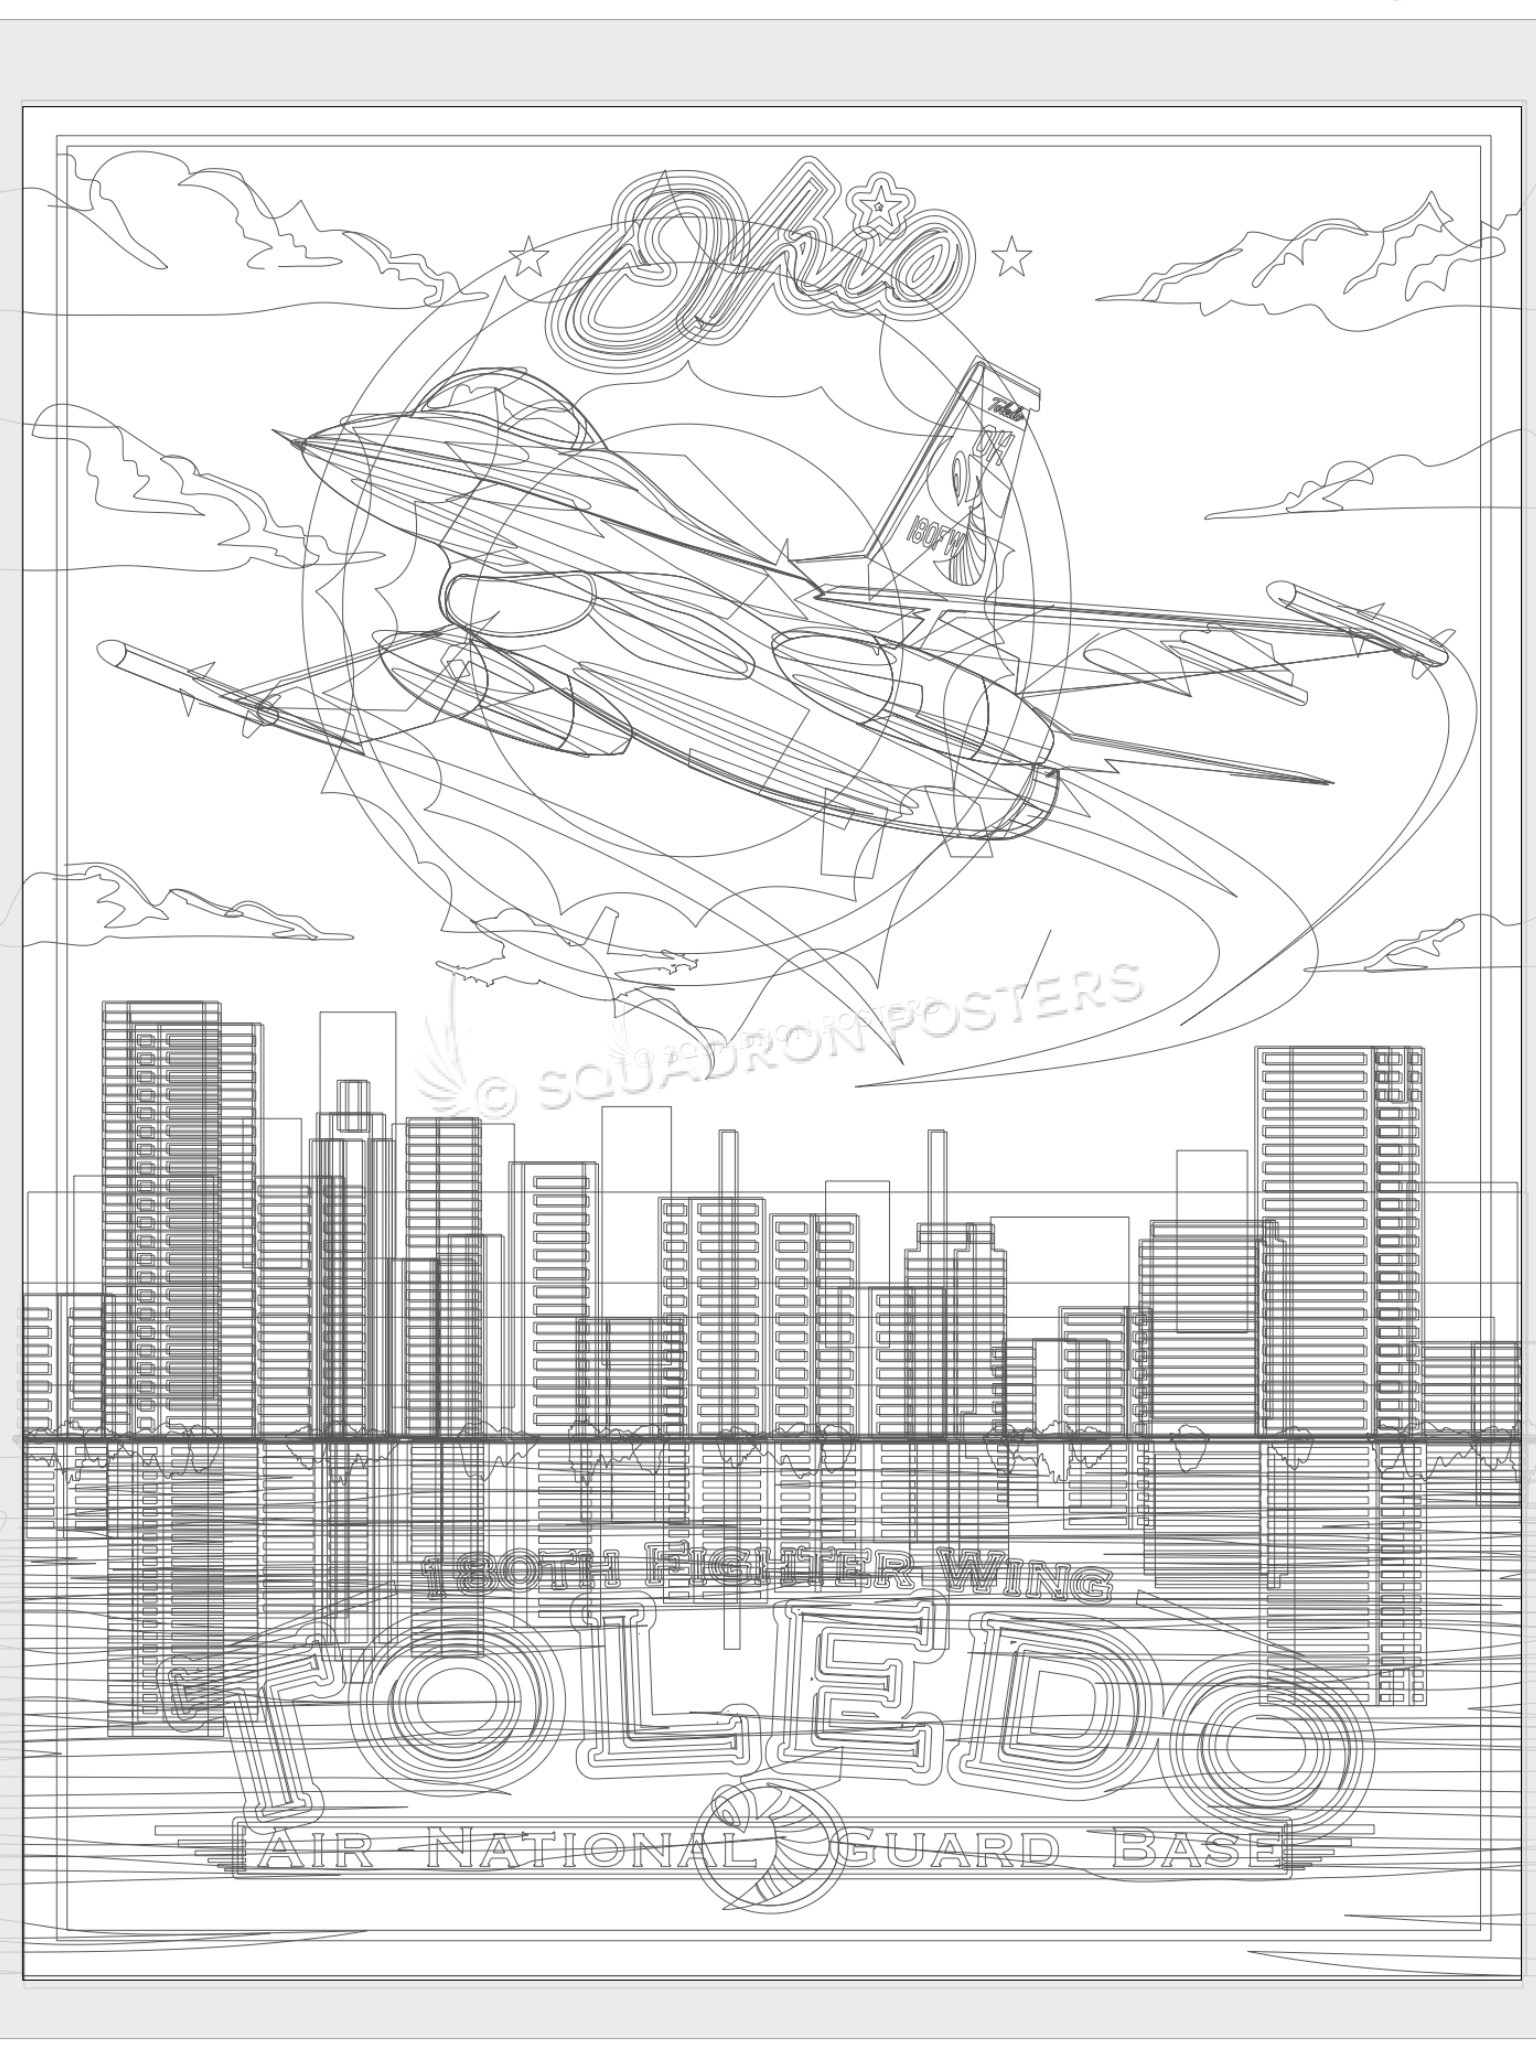 Toledo Sketch - Squadron Posters